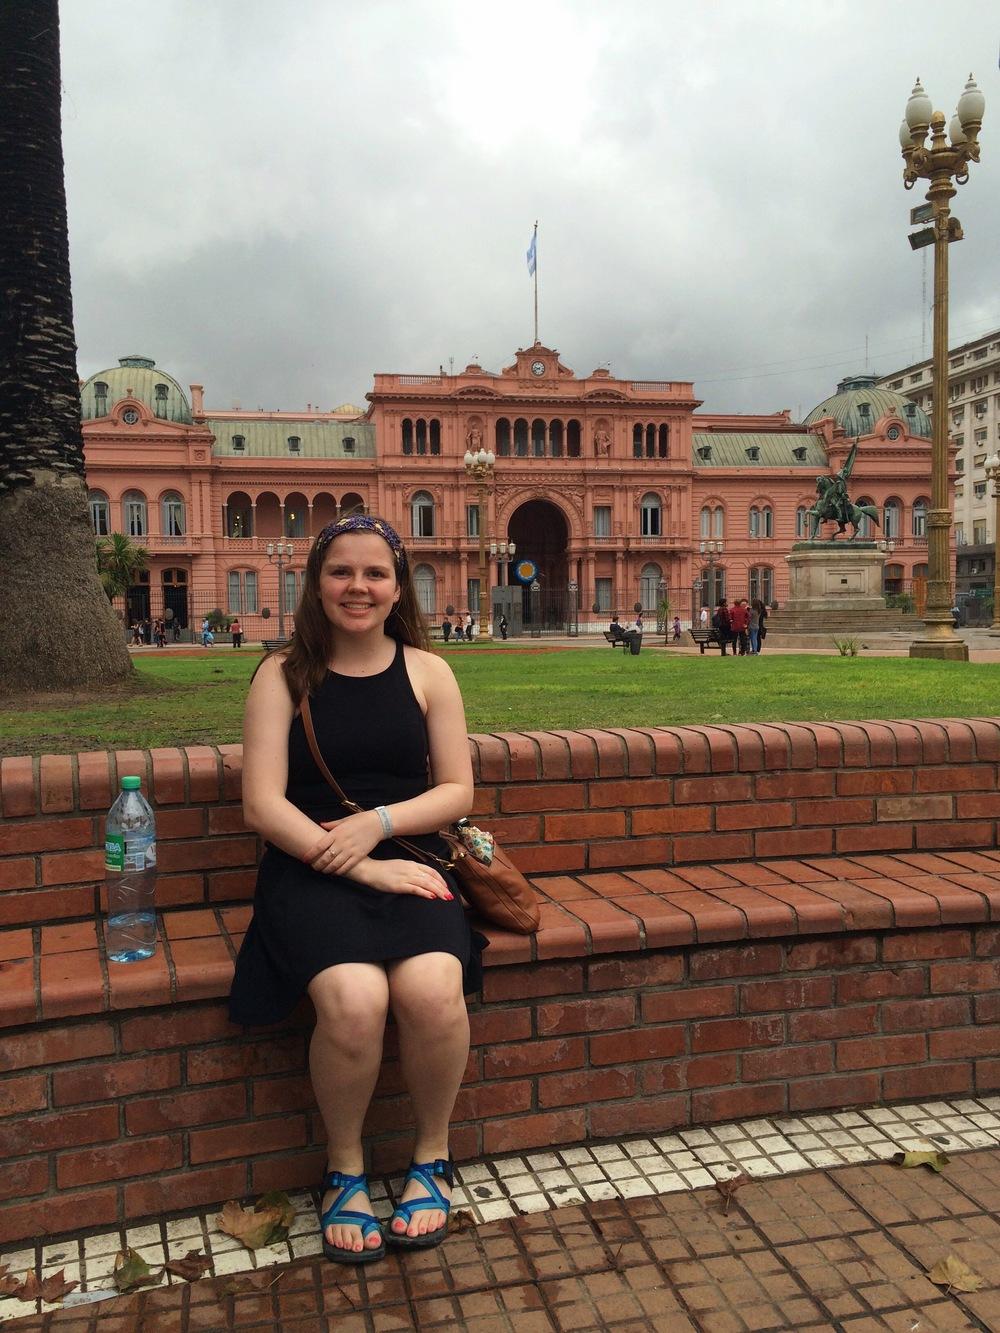 La Casa Rosada: mansion + executive office of the President of Argentina